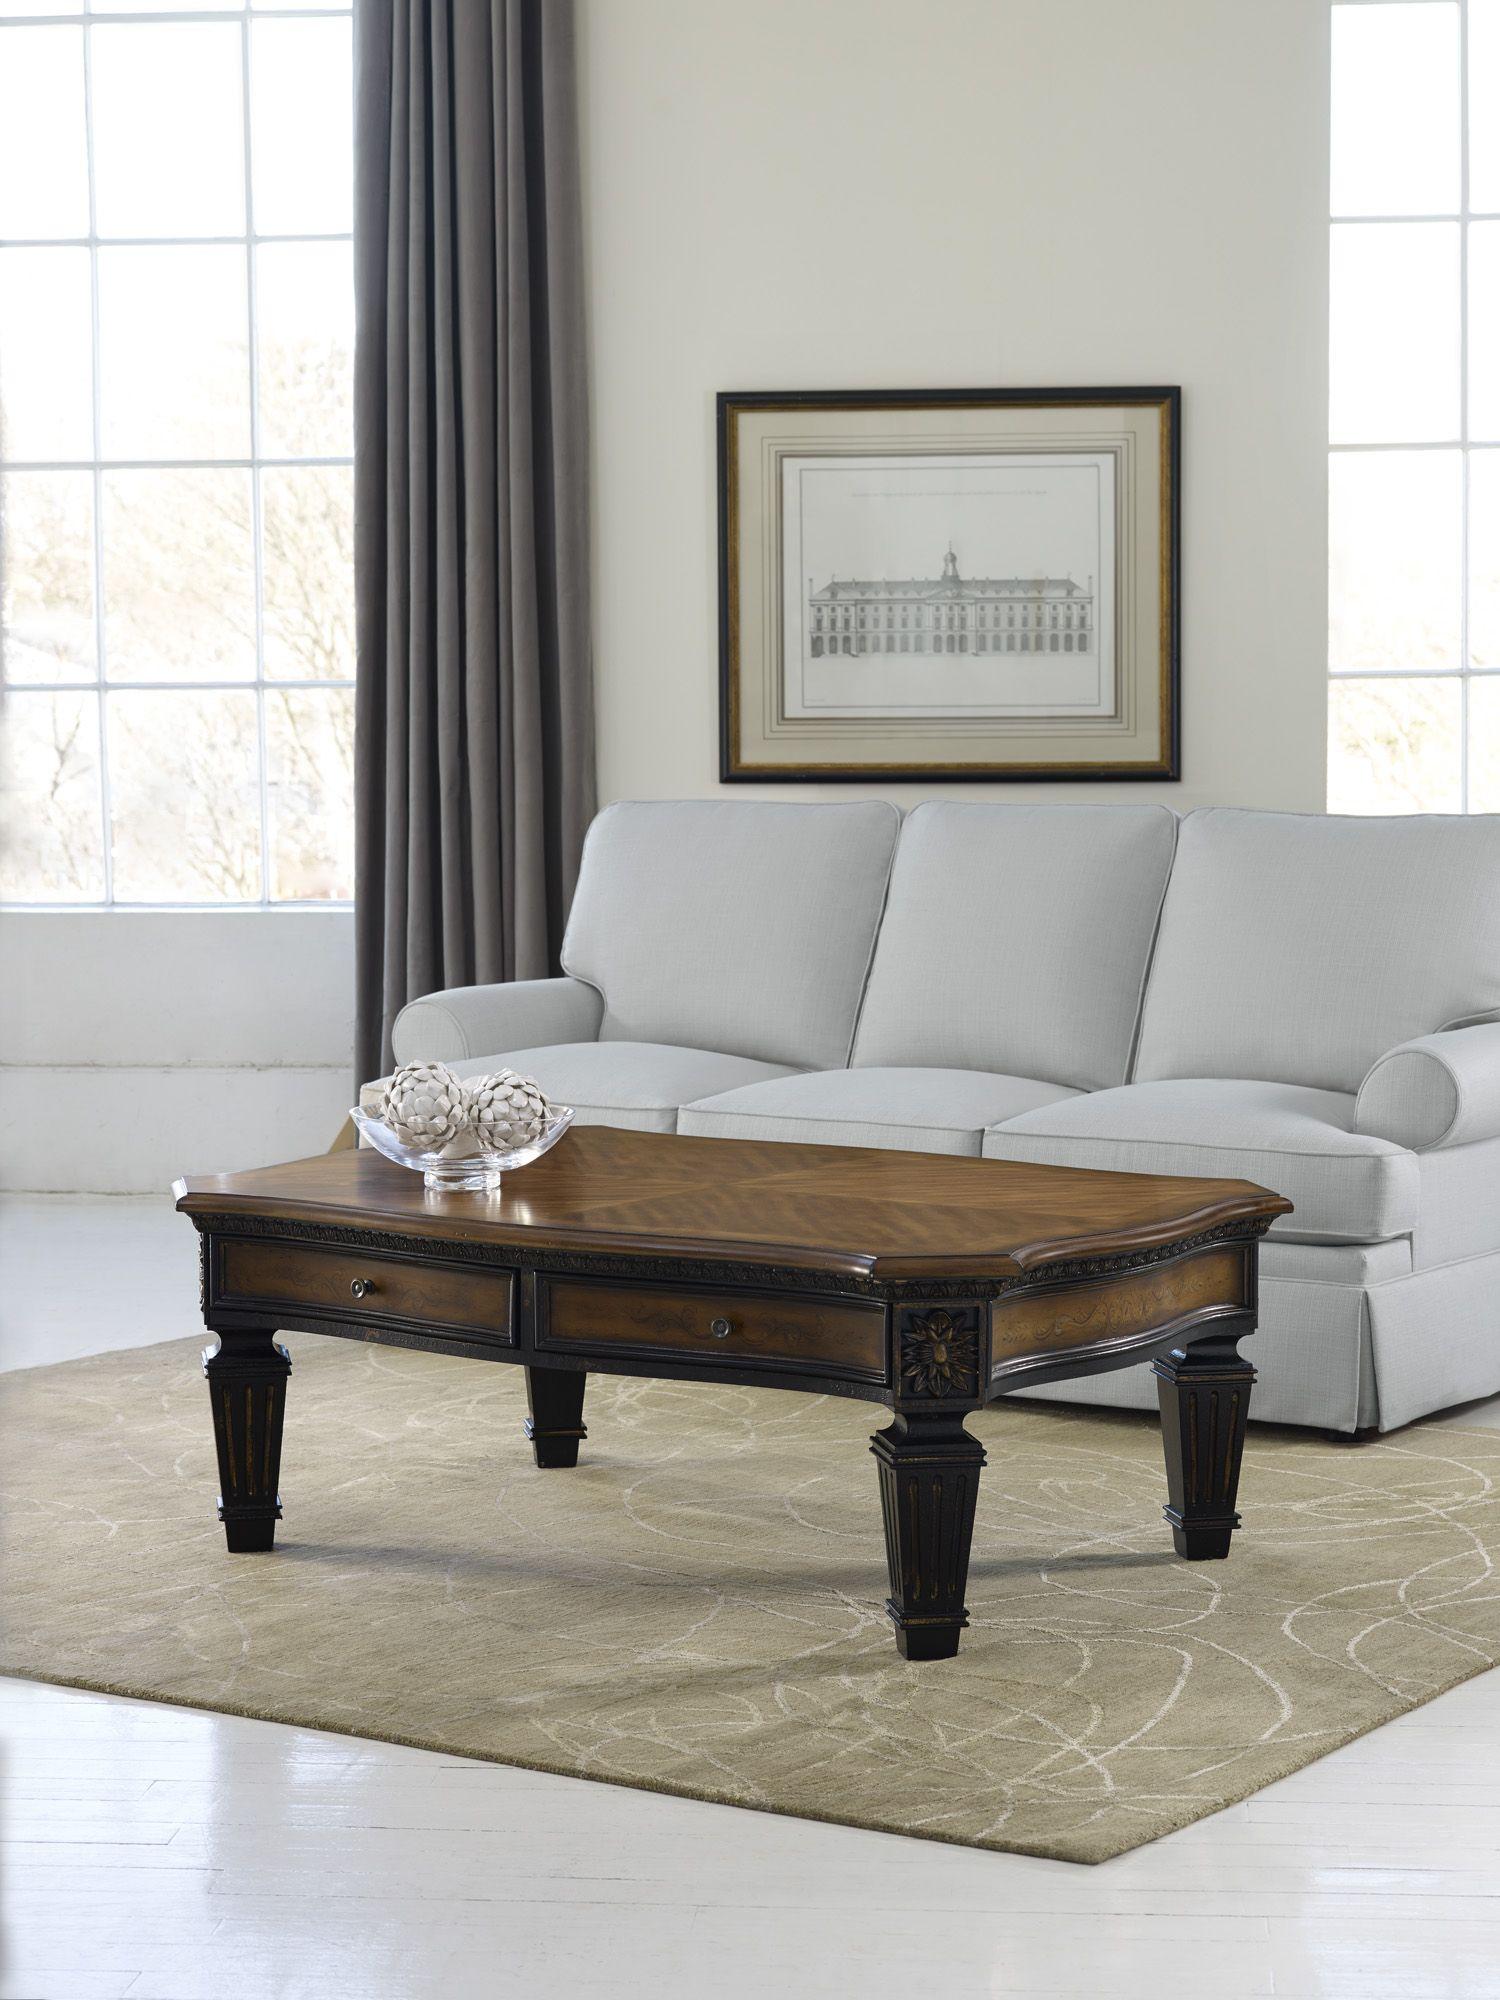 H Contract Furniture | 779 80 110 North Hampton Rectangular Cocktail Table